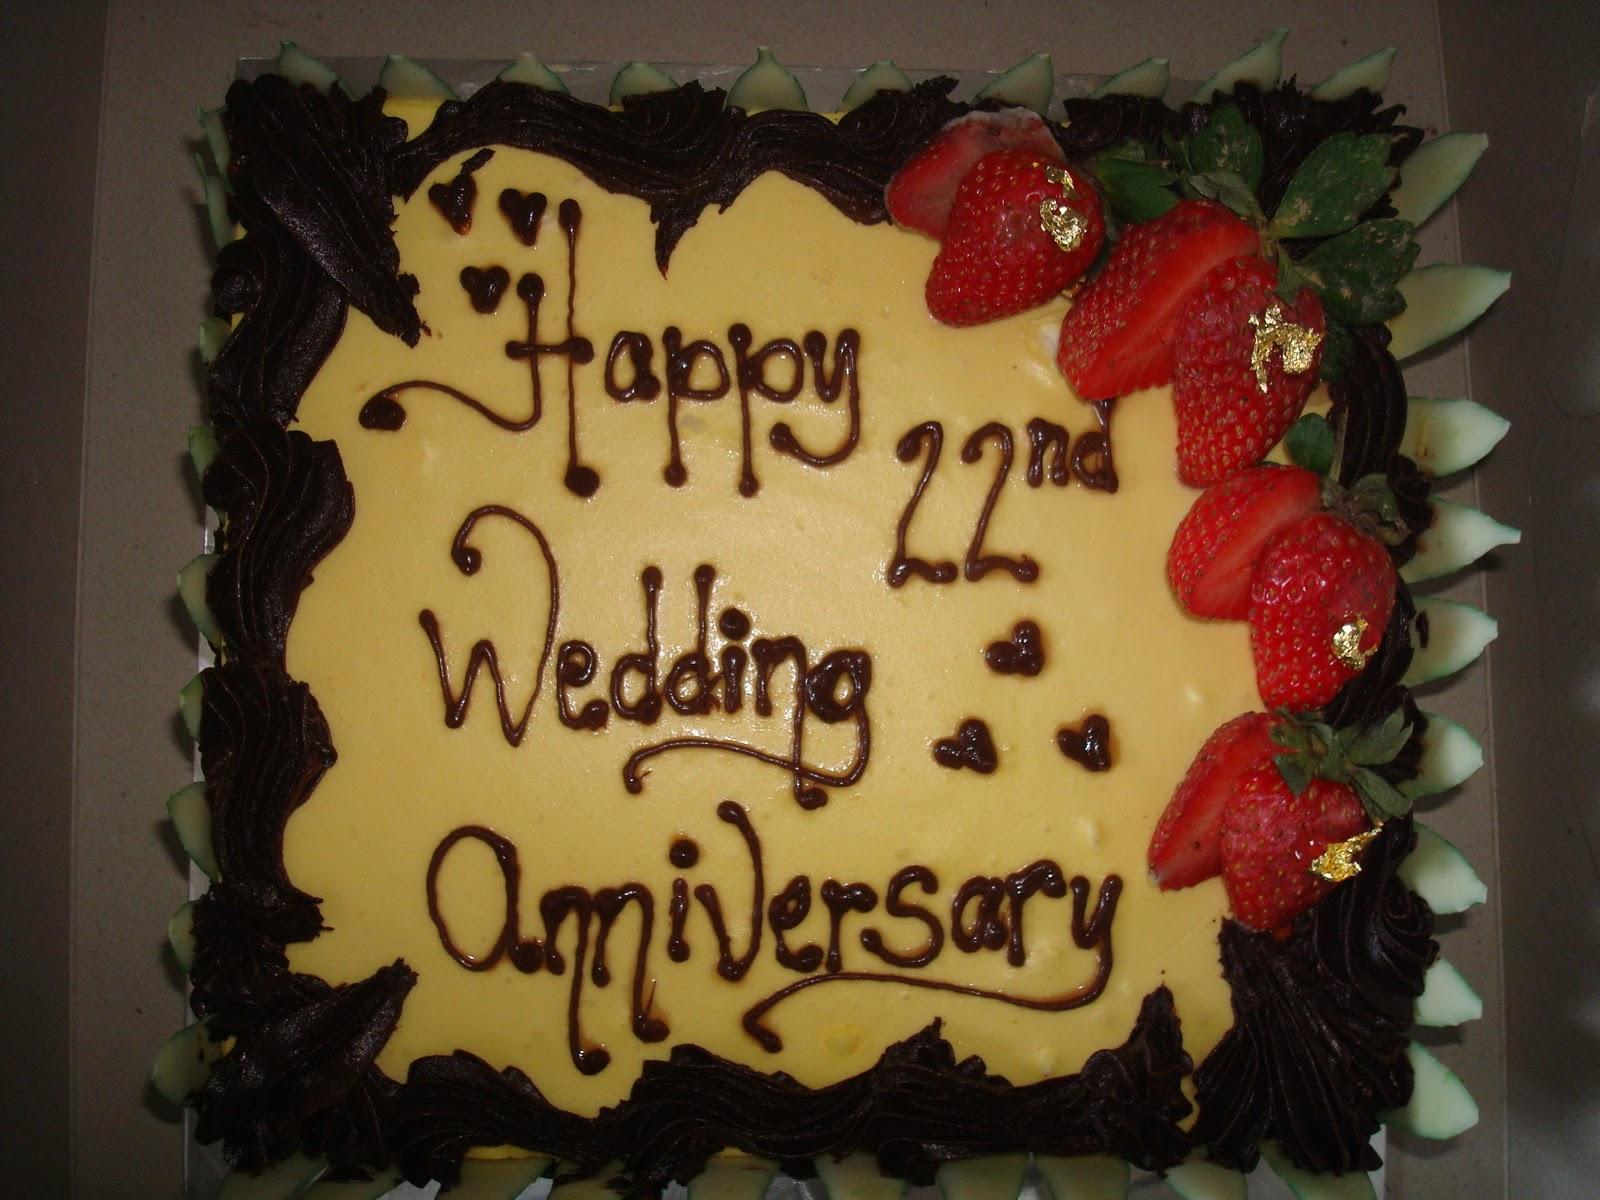 22nd Wedding Anniversary Gift Ideas: Tari's Blog: A Mexican Themed Bridal